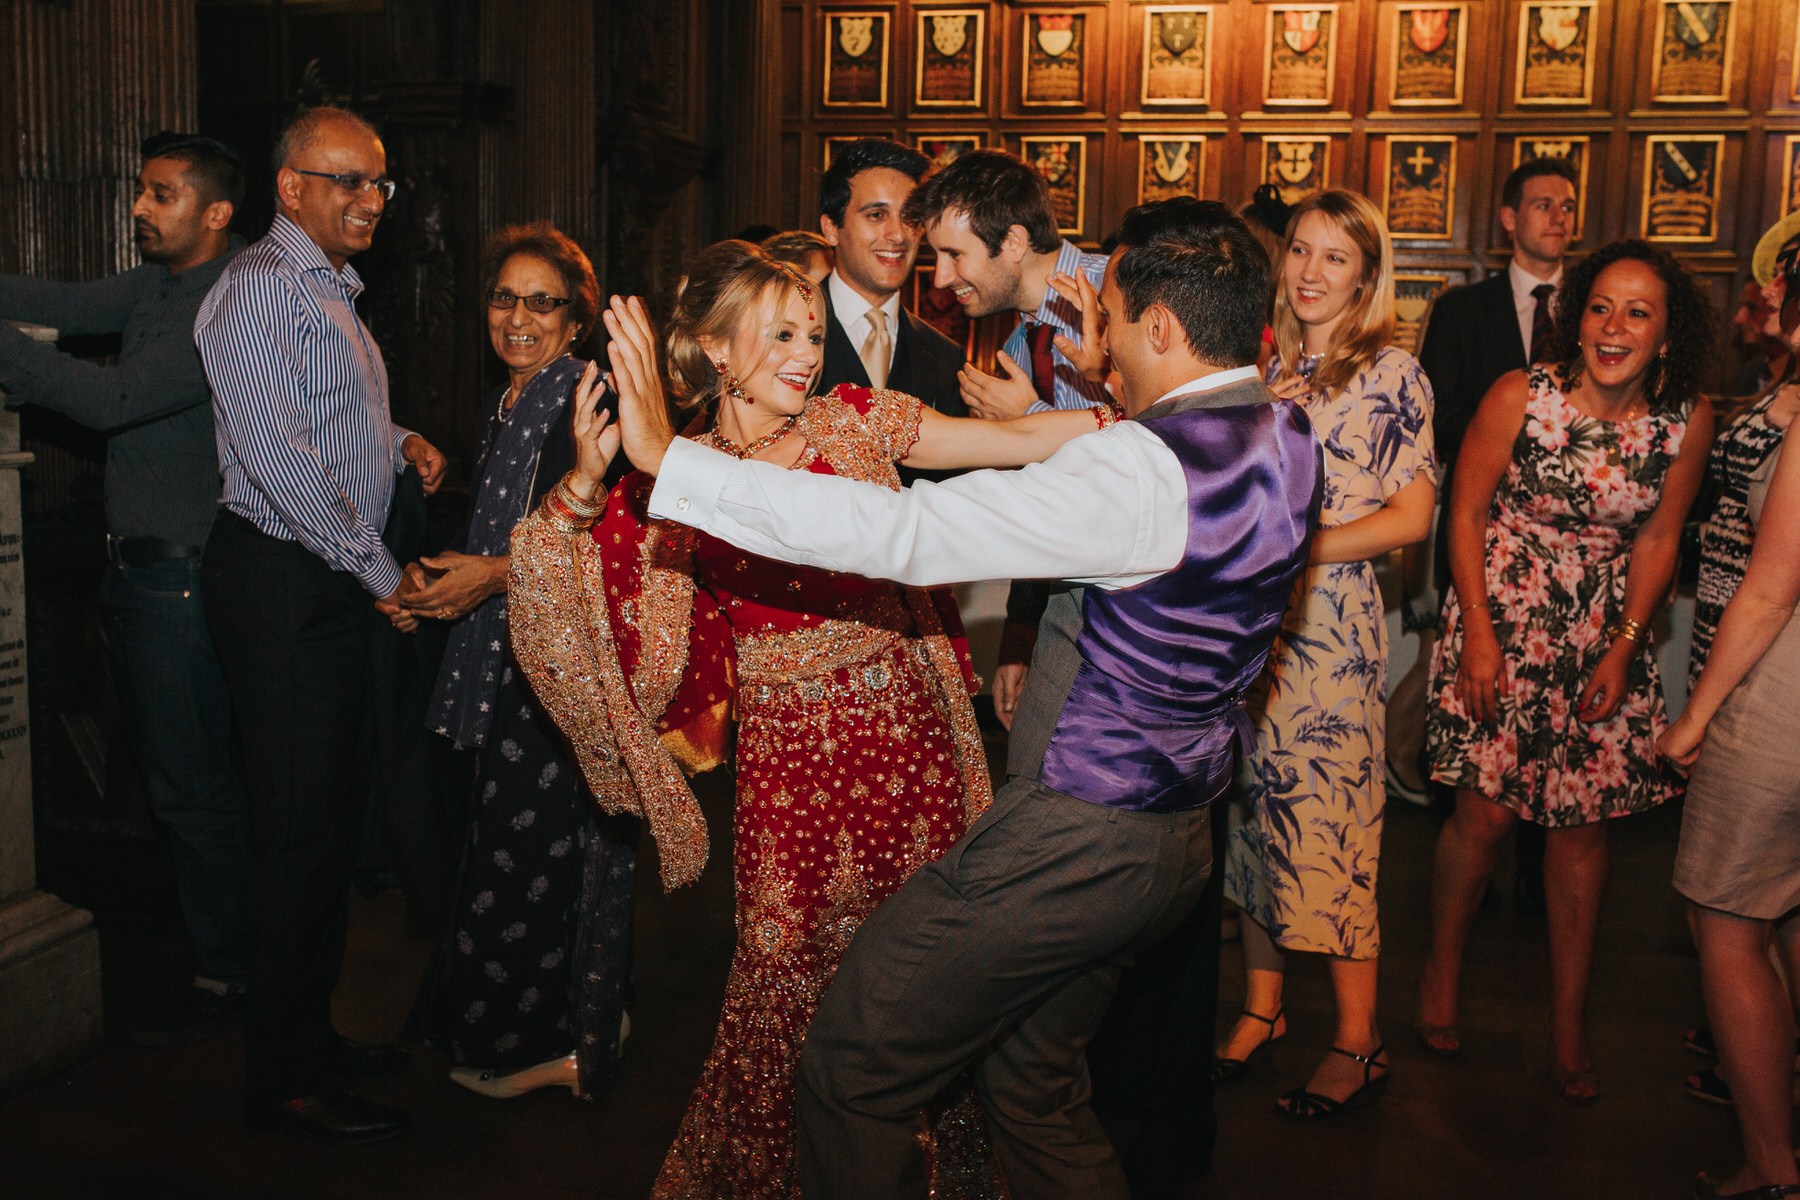 227-Anglo-Asian-London-Wedding-bride-dancing.jpg